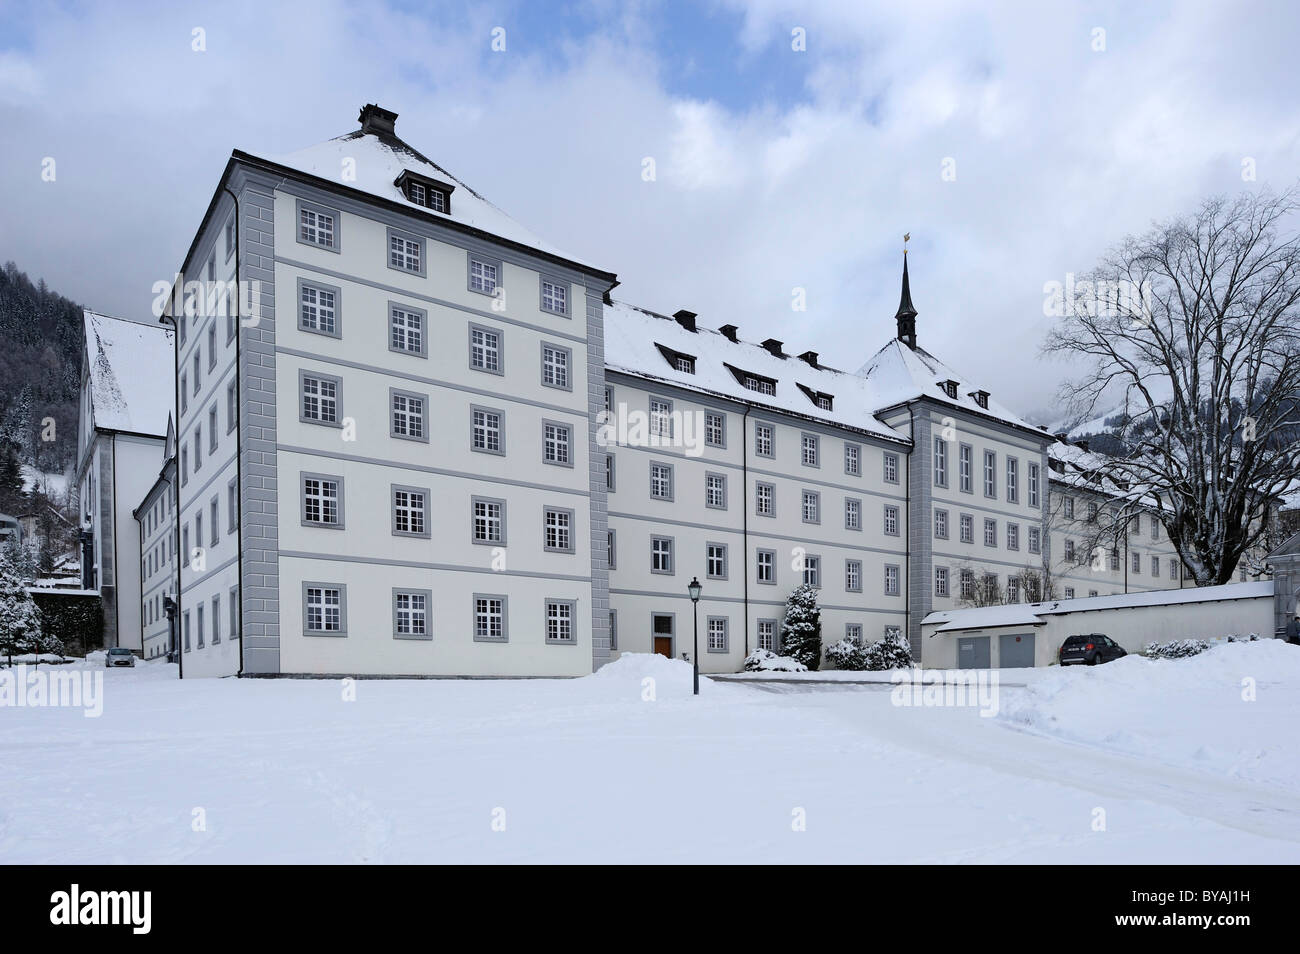 Monastère Kloster Engelberg, Switzerland, Suisse, Europe Photo Stock